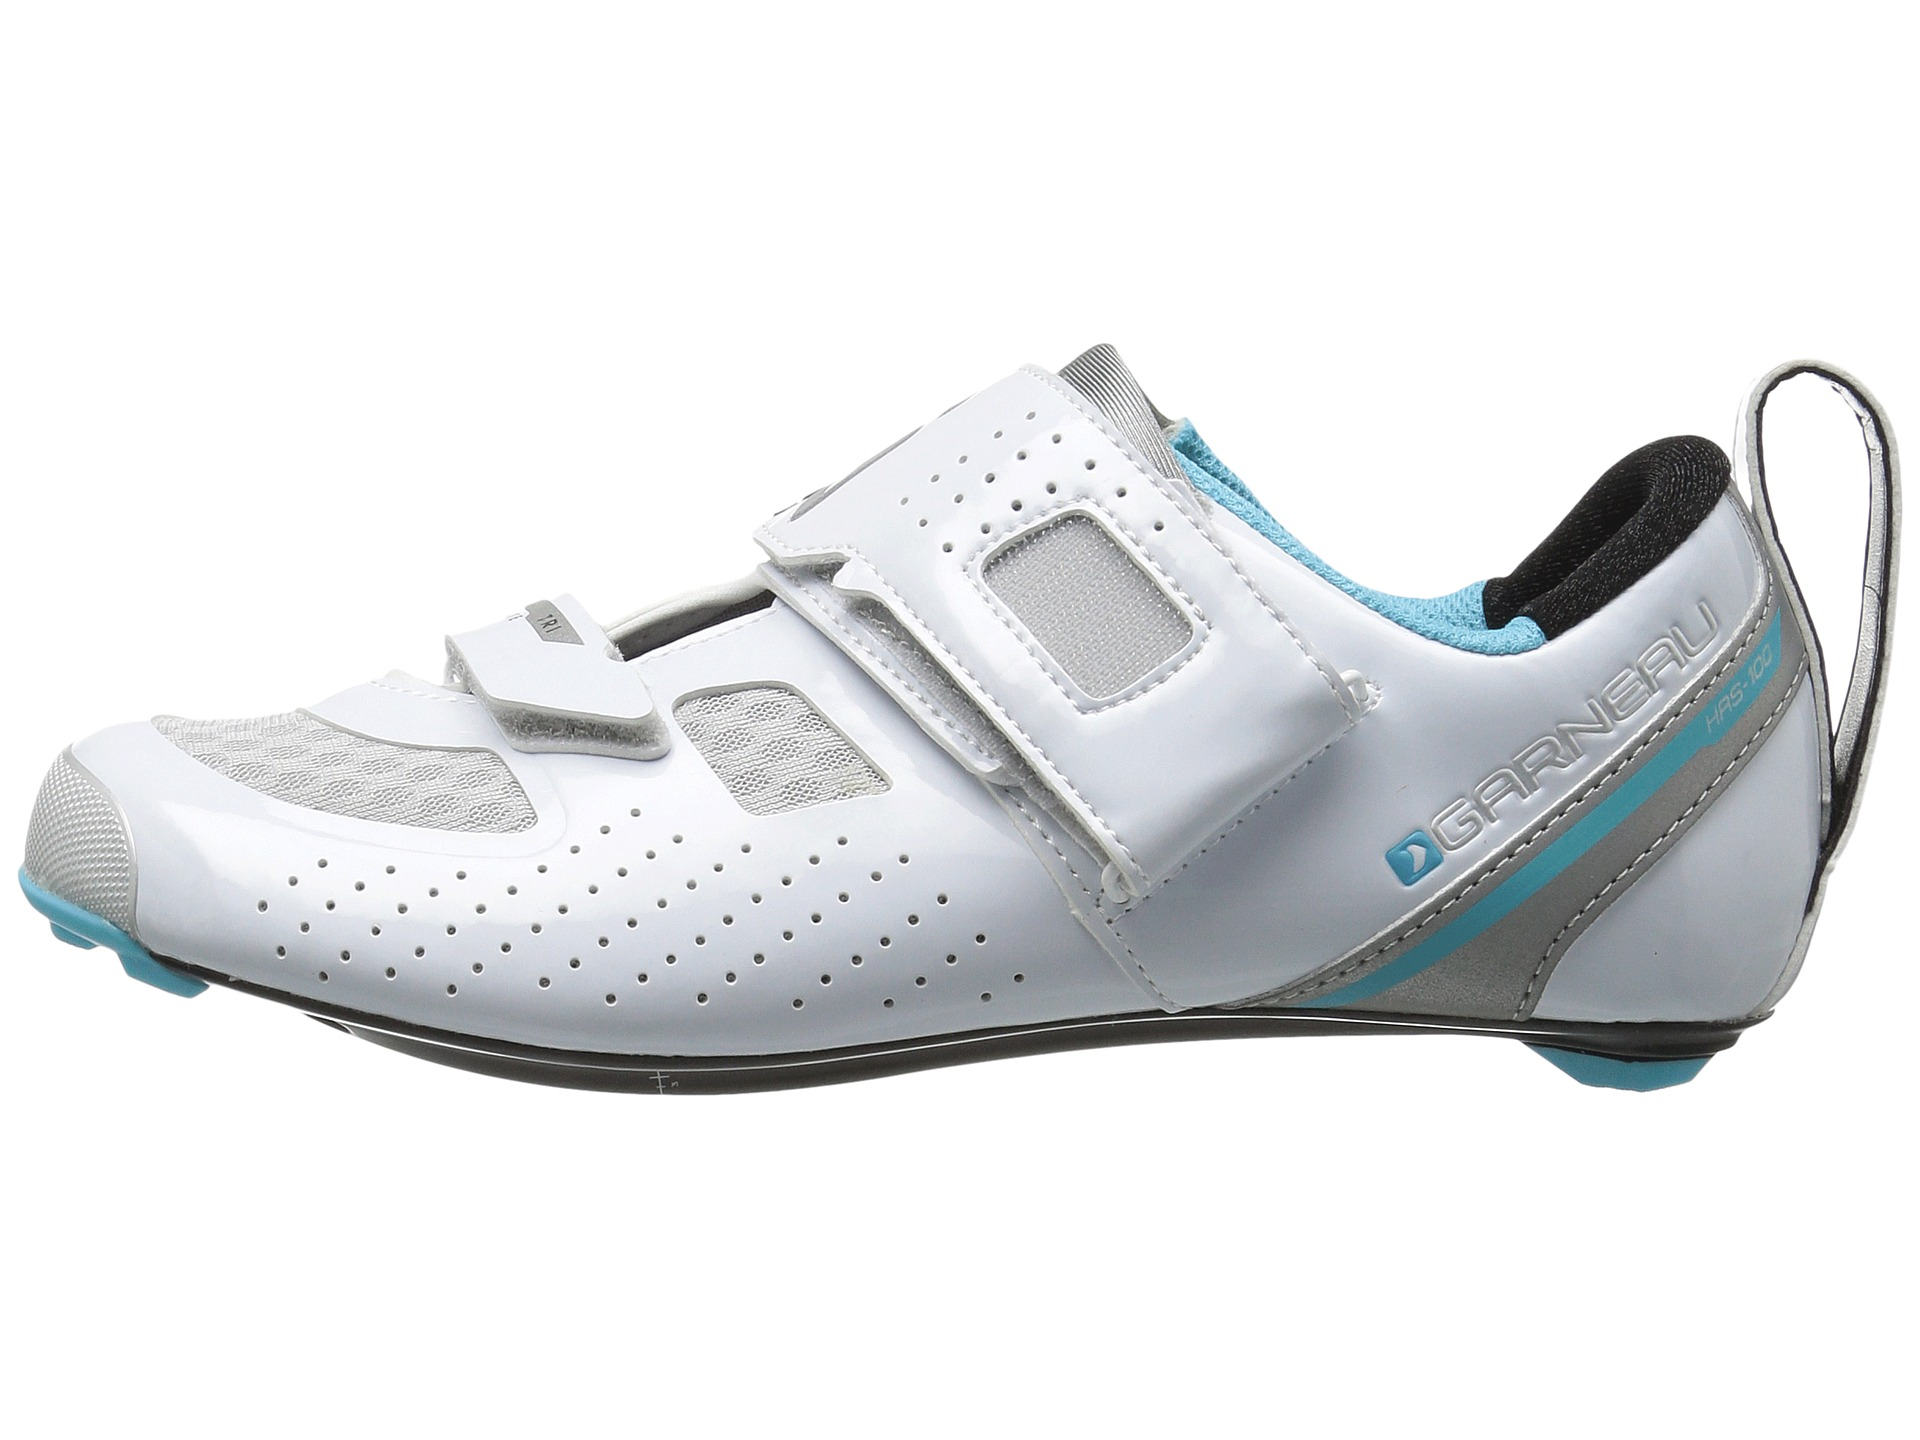 Garneau Women Tri Shoes Size  Sale